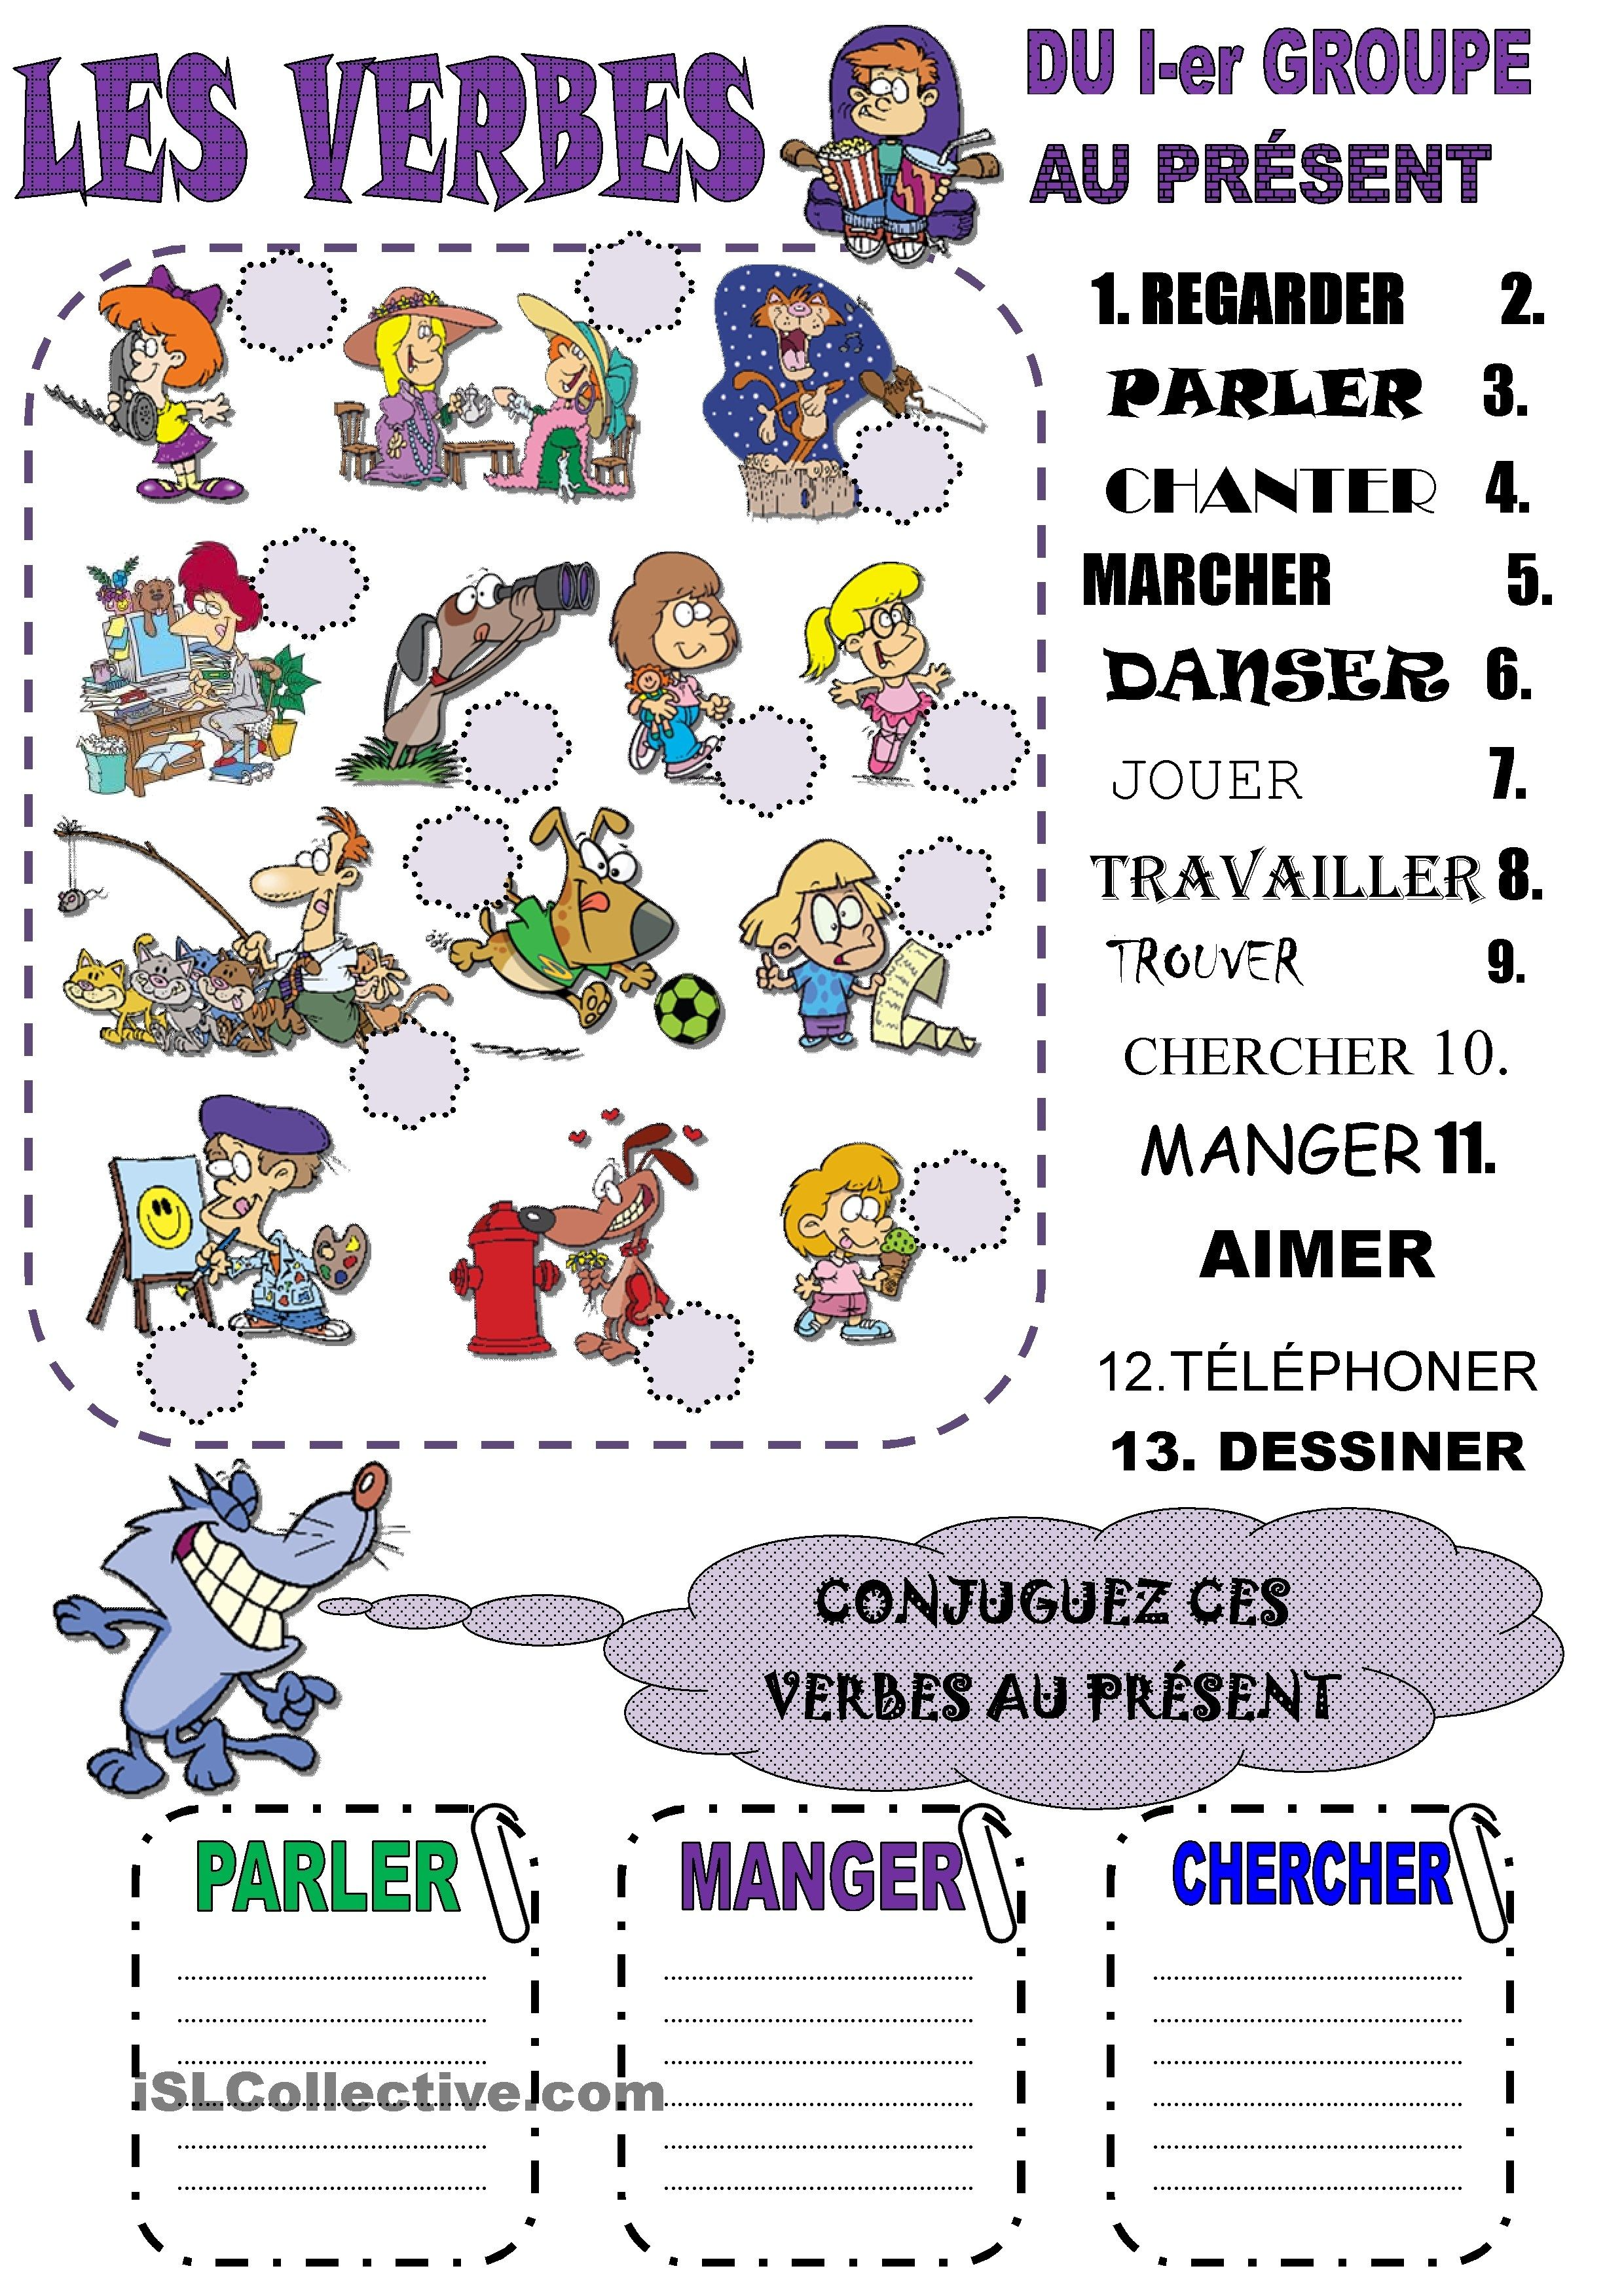 Les Verbes Du I Er Groupe Au Present